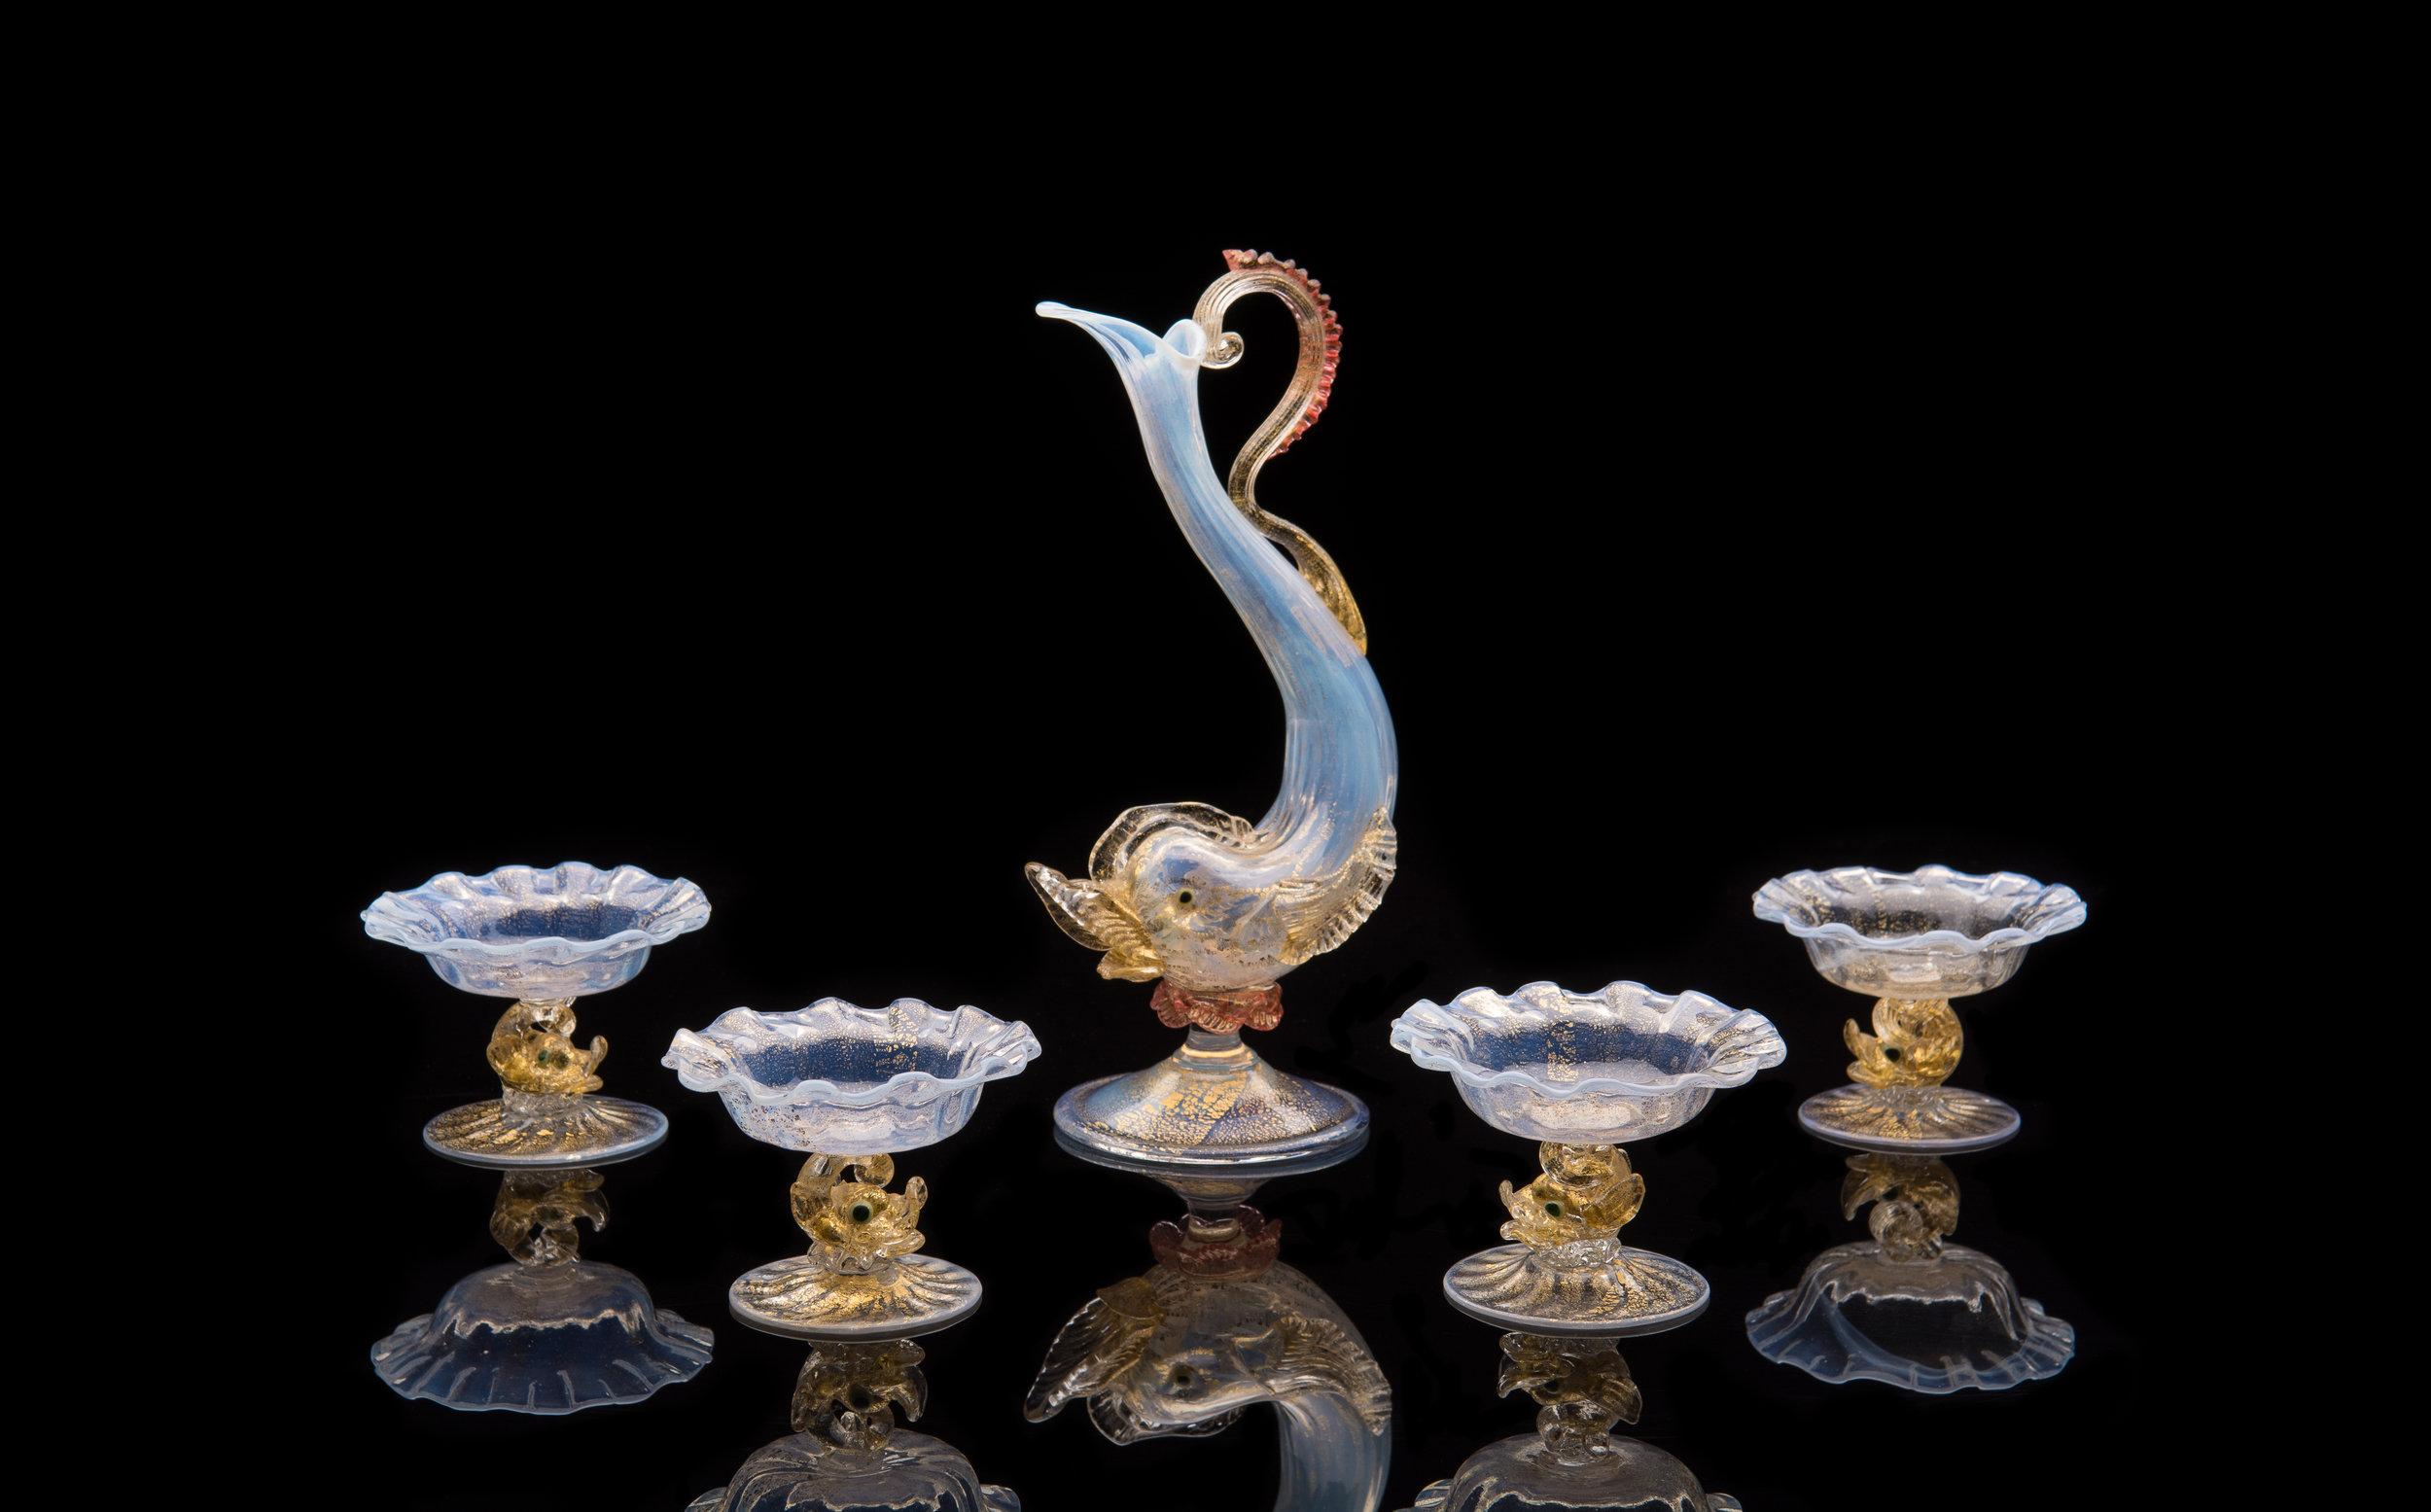 Salviati and Company,  Girasol Dolphin Salt Dishes  (circa 1870, glass, 2.25 inches), VV.197